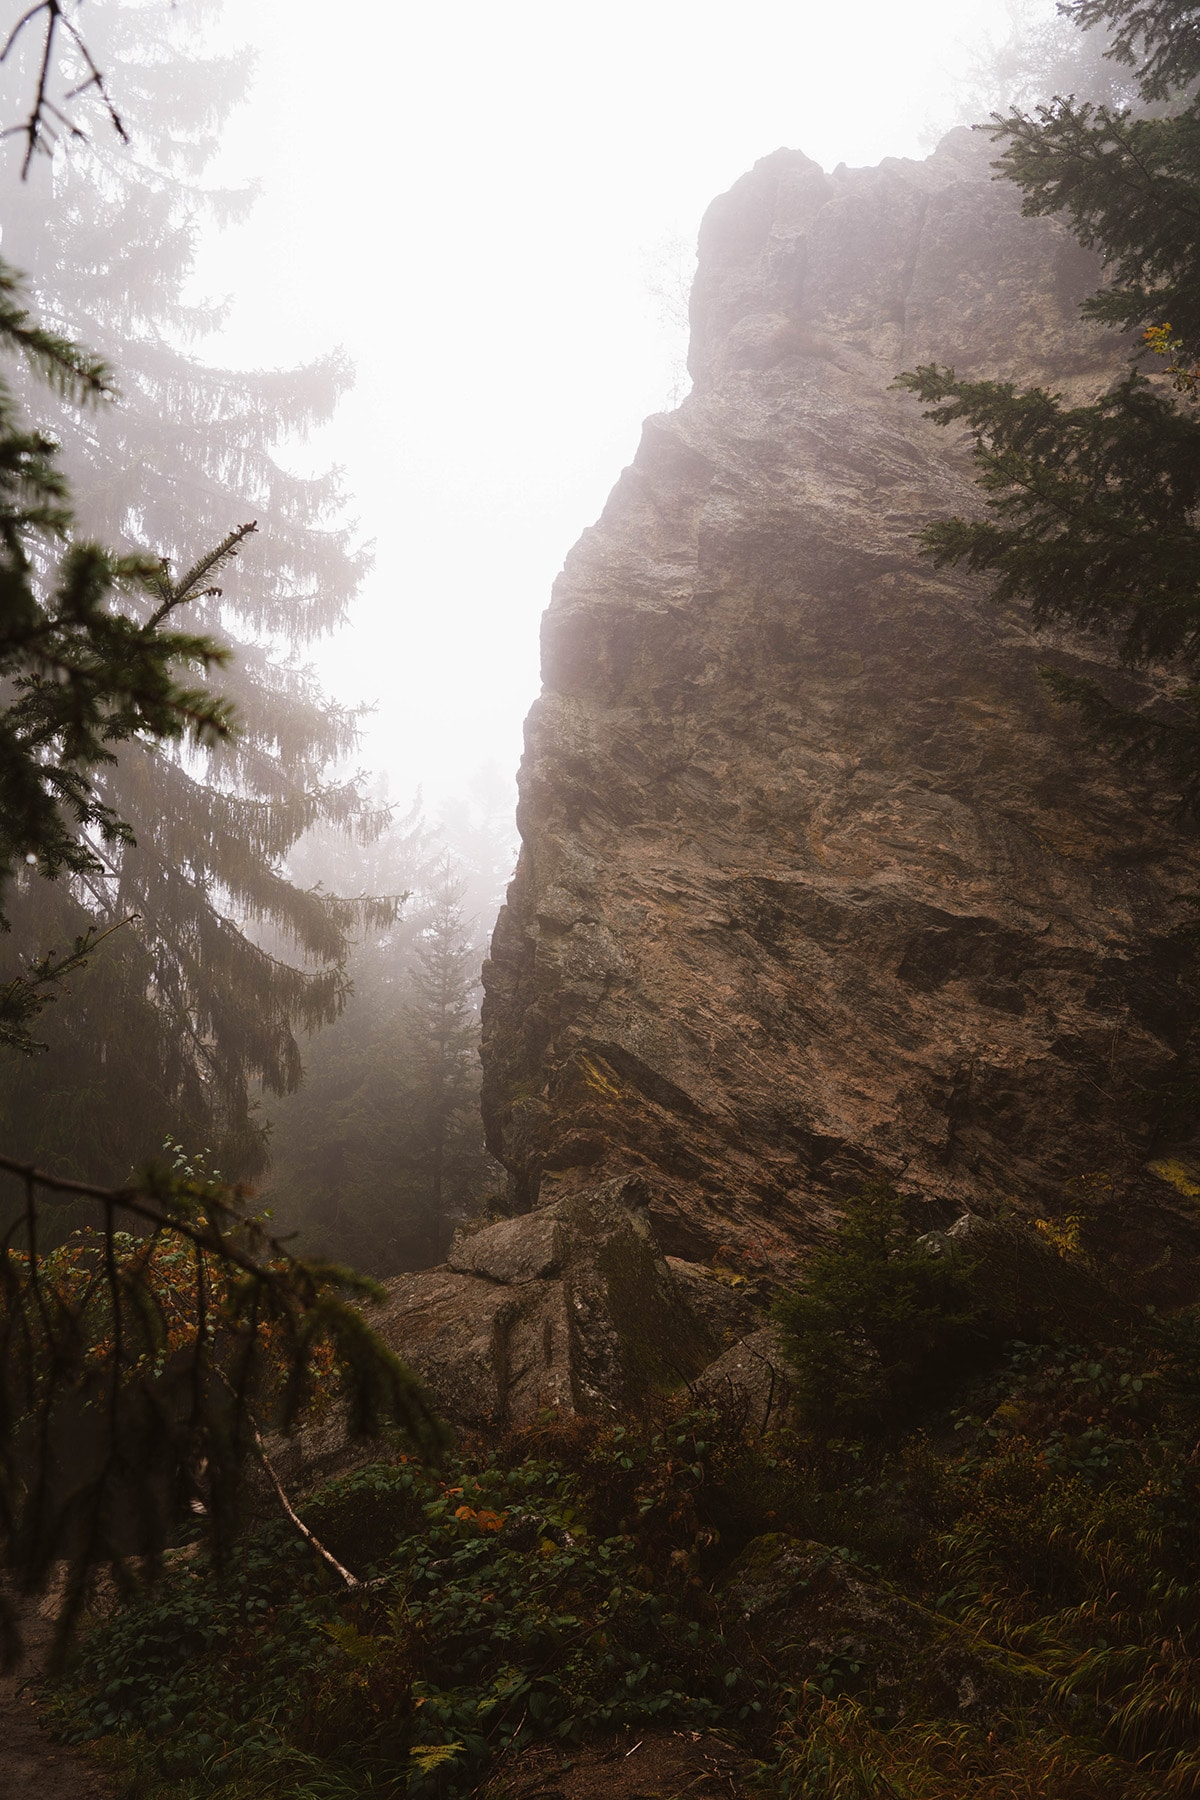 kaitersberg-felsen-wald-nebel